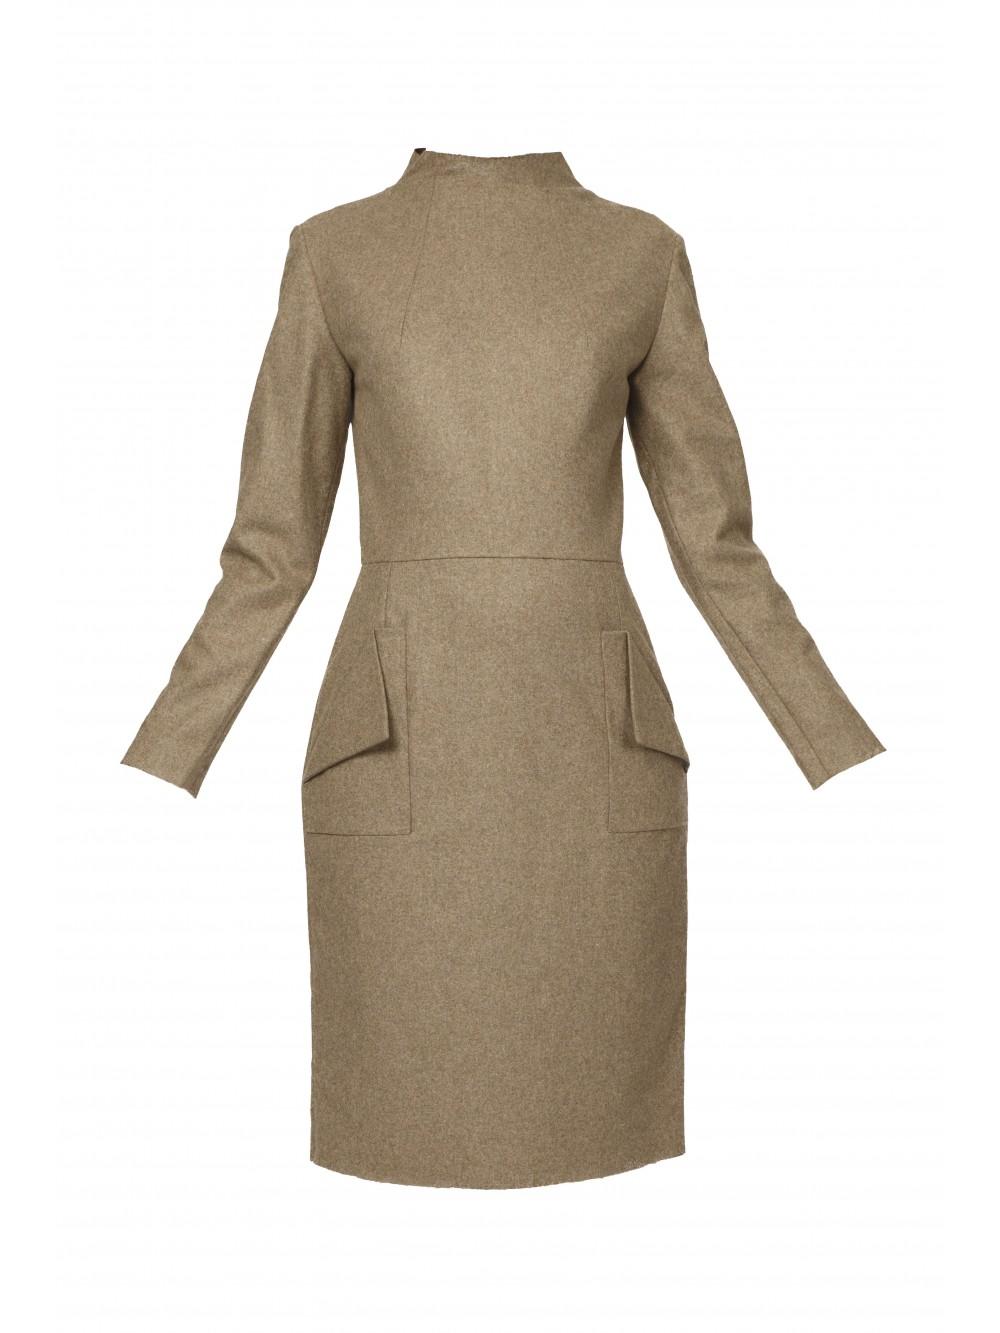 Raw Collar Dress With Folder Pockets   Ache